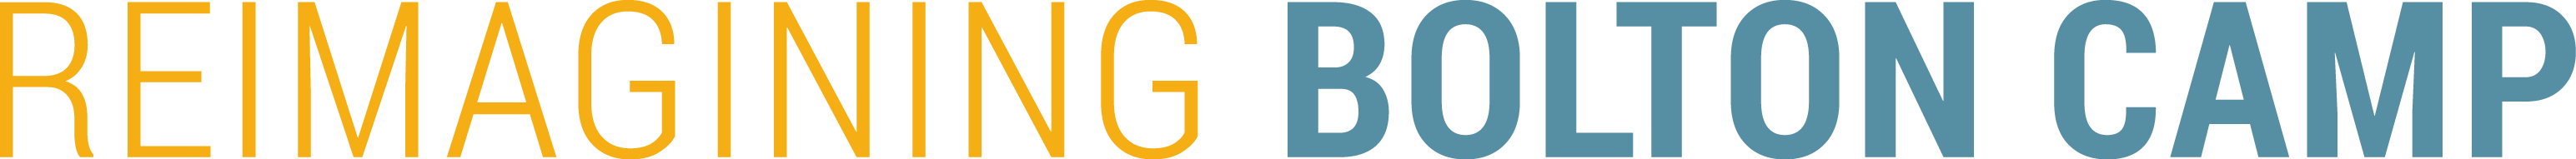 Reimagining Bolton Camp logo